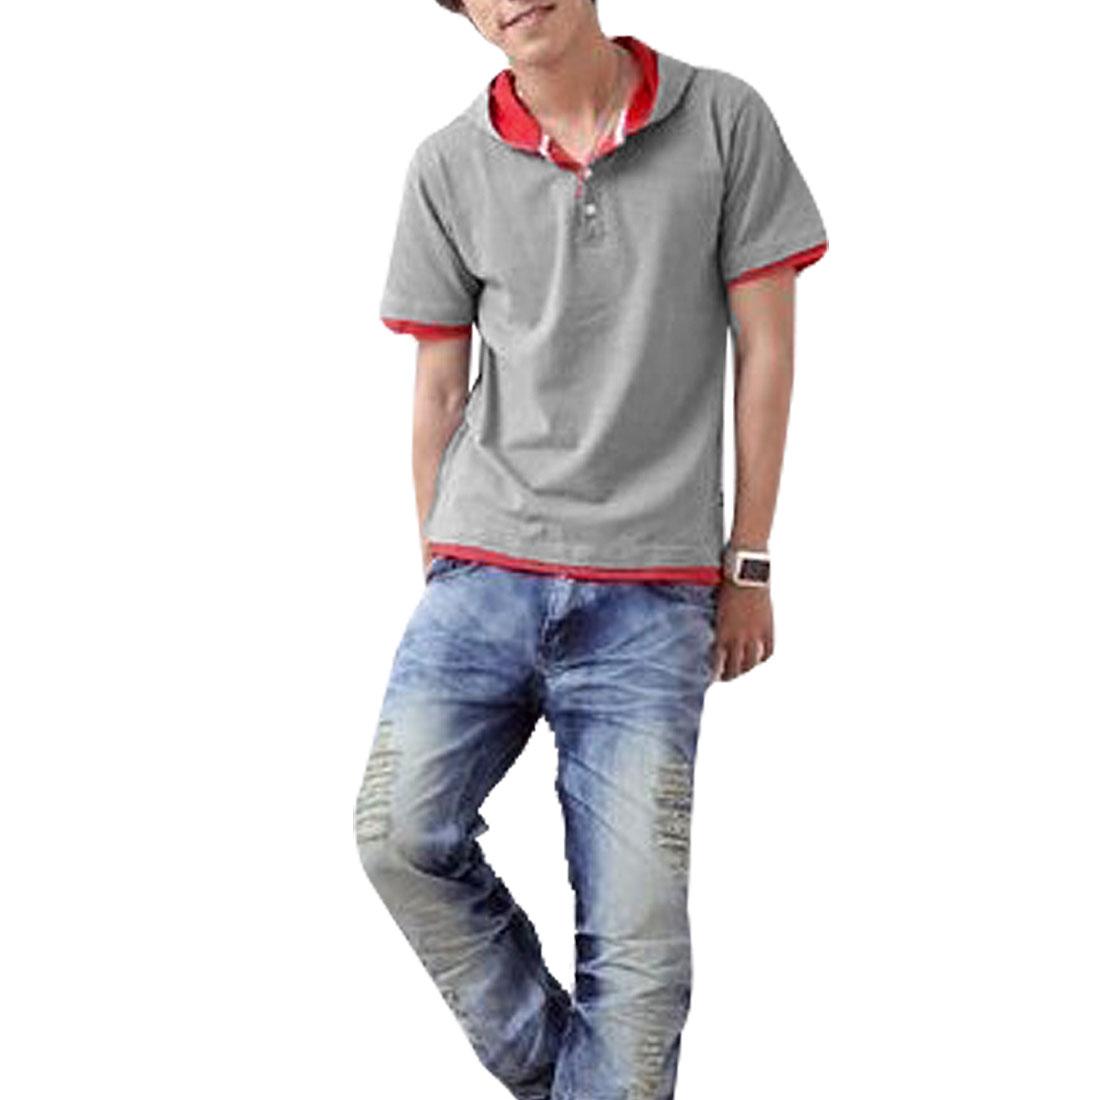 Man Short Sleeves Gray Red Hoodie Shirt Top S